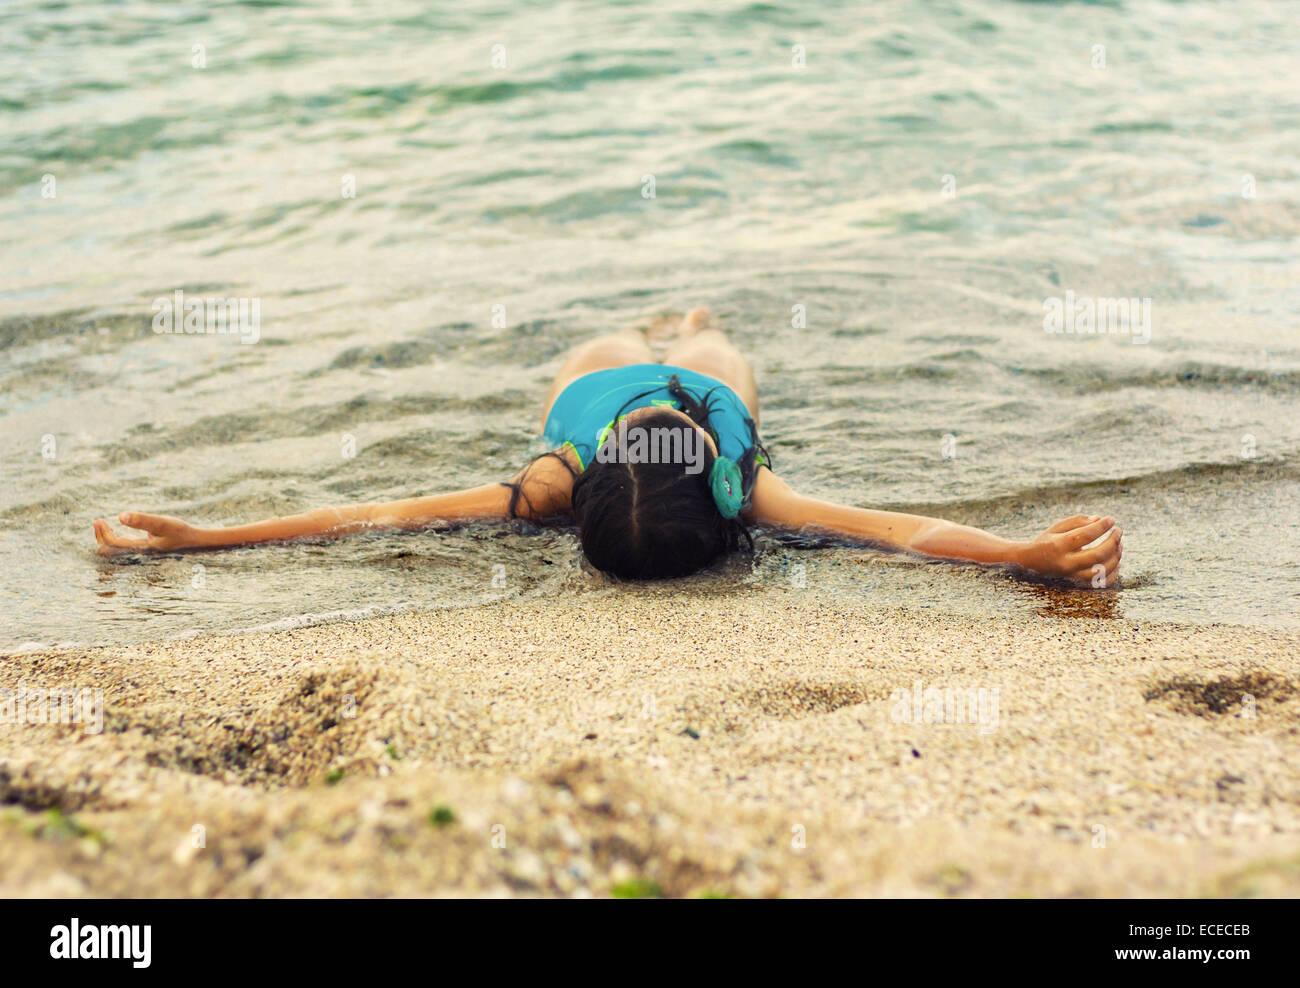 Little girl (6-7) lying on beach in waves - Stock Image